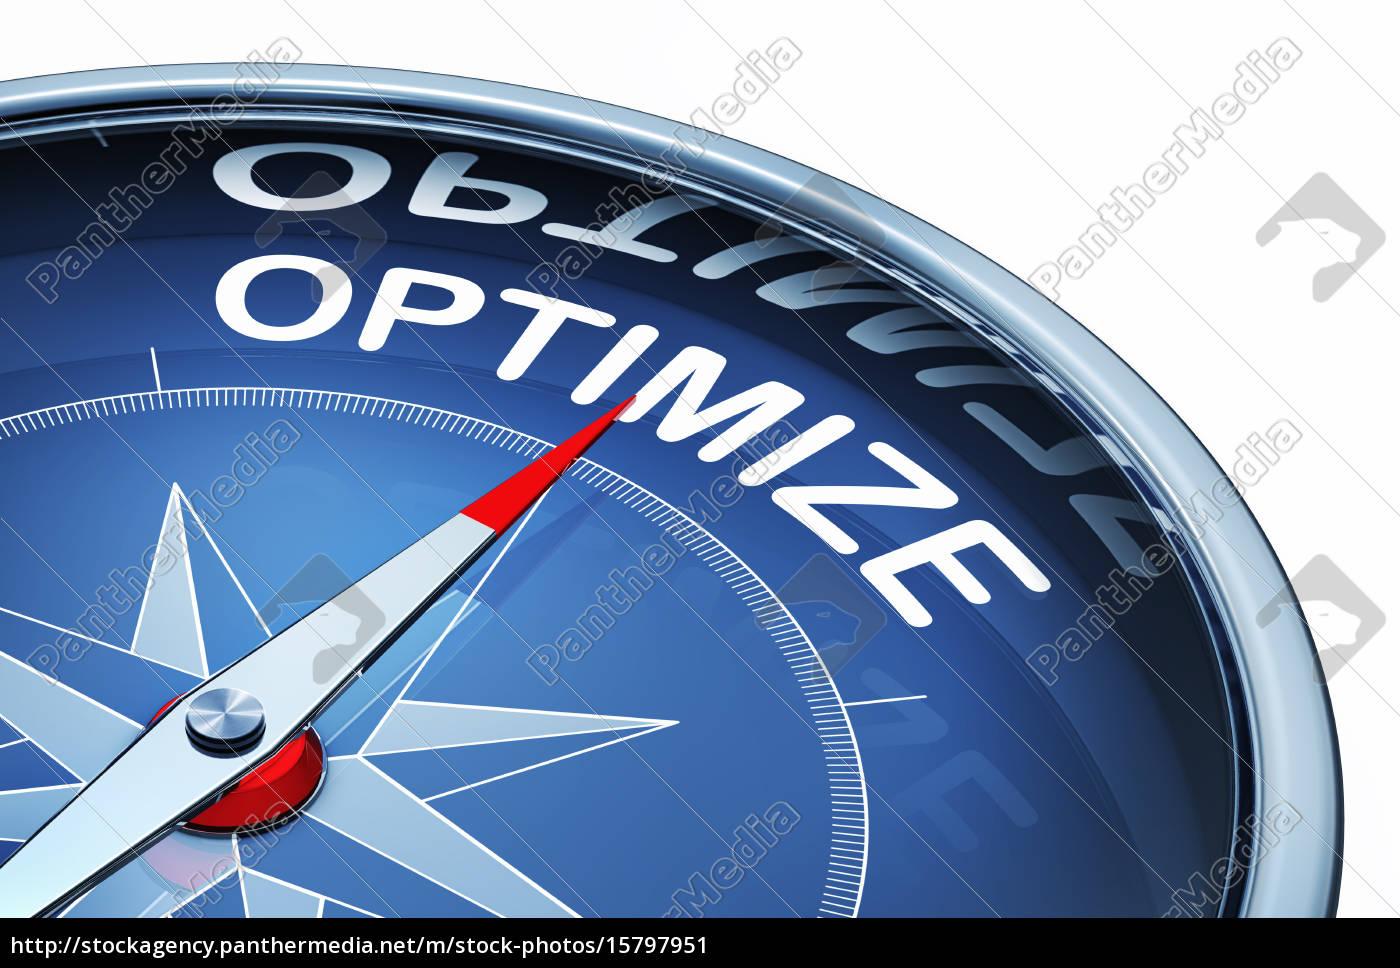 optimize - 15797951